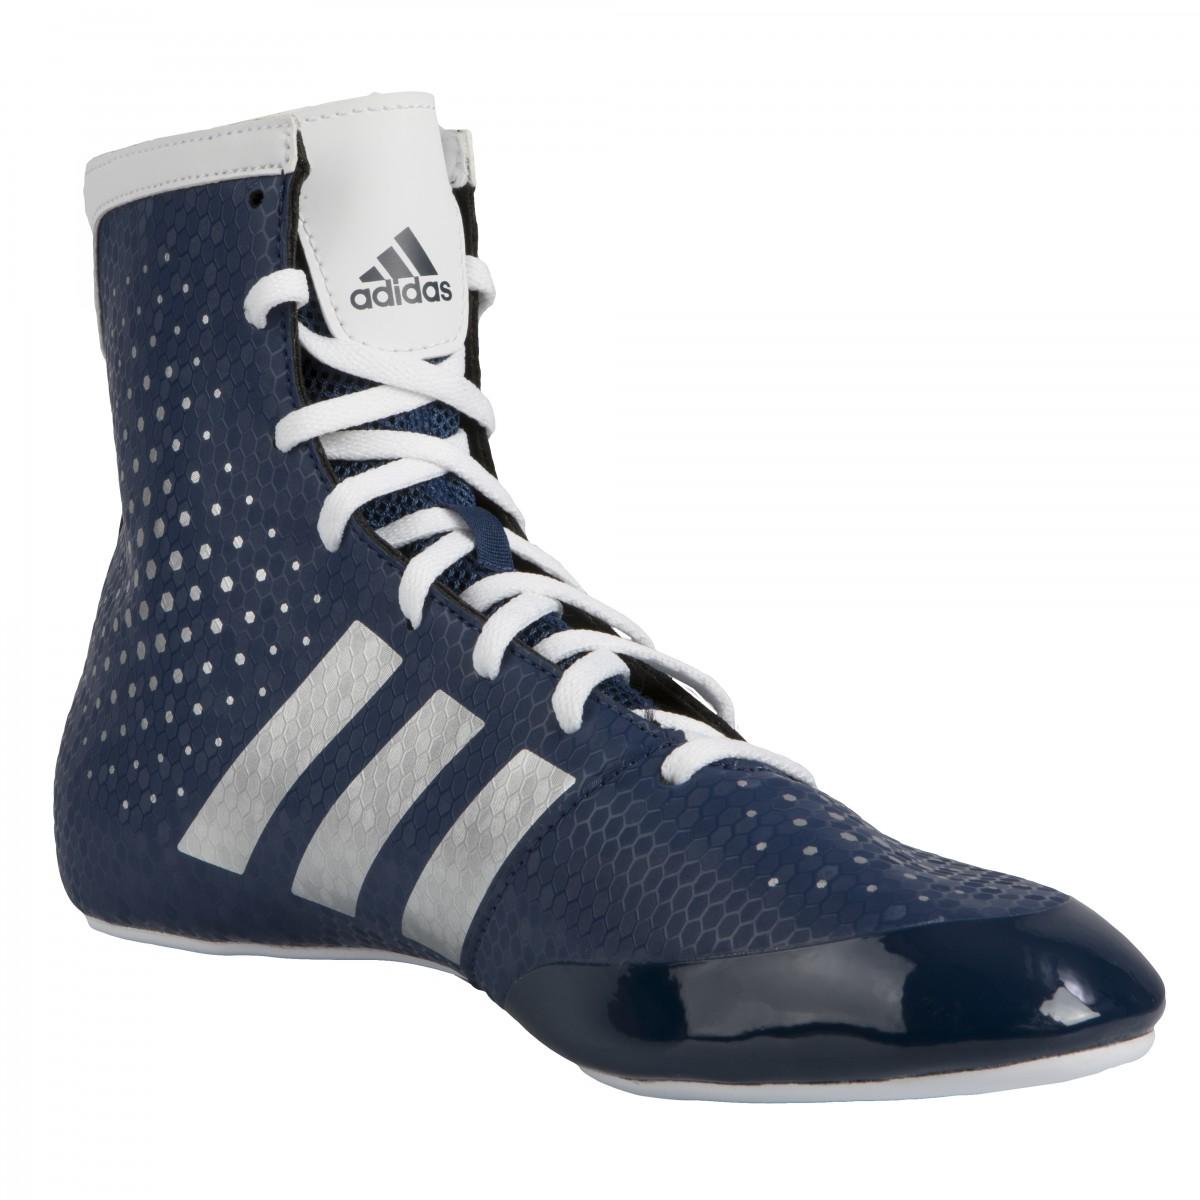 Adidas Ko Legend 16 2 Boxing Shoes